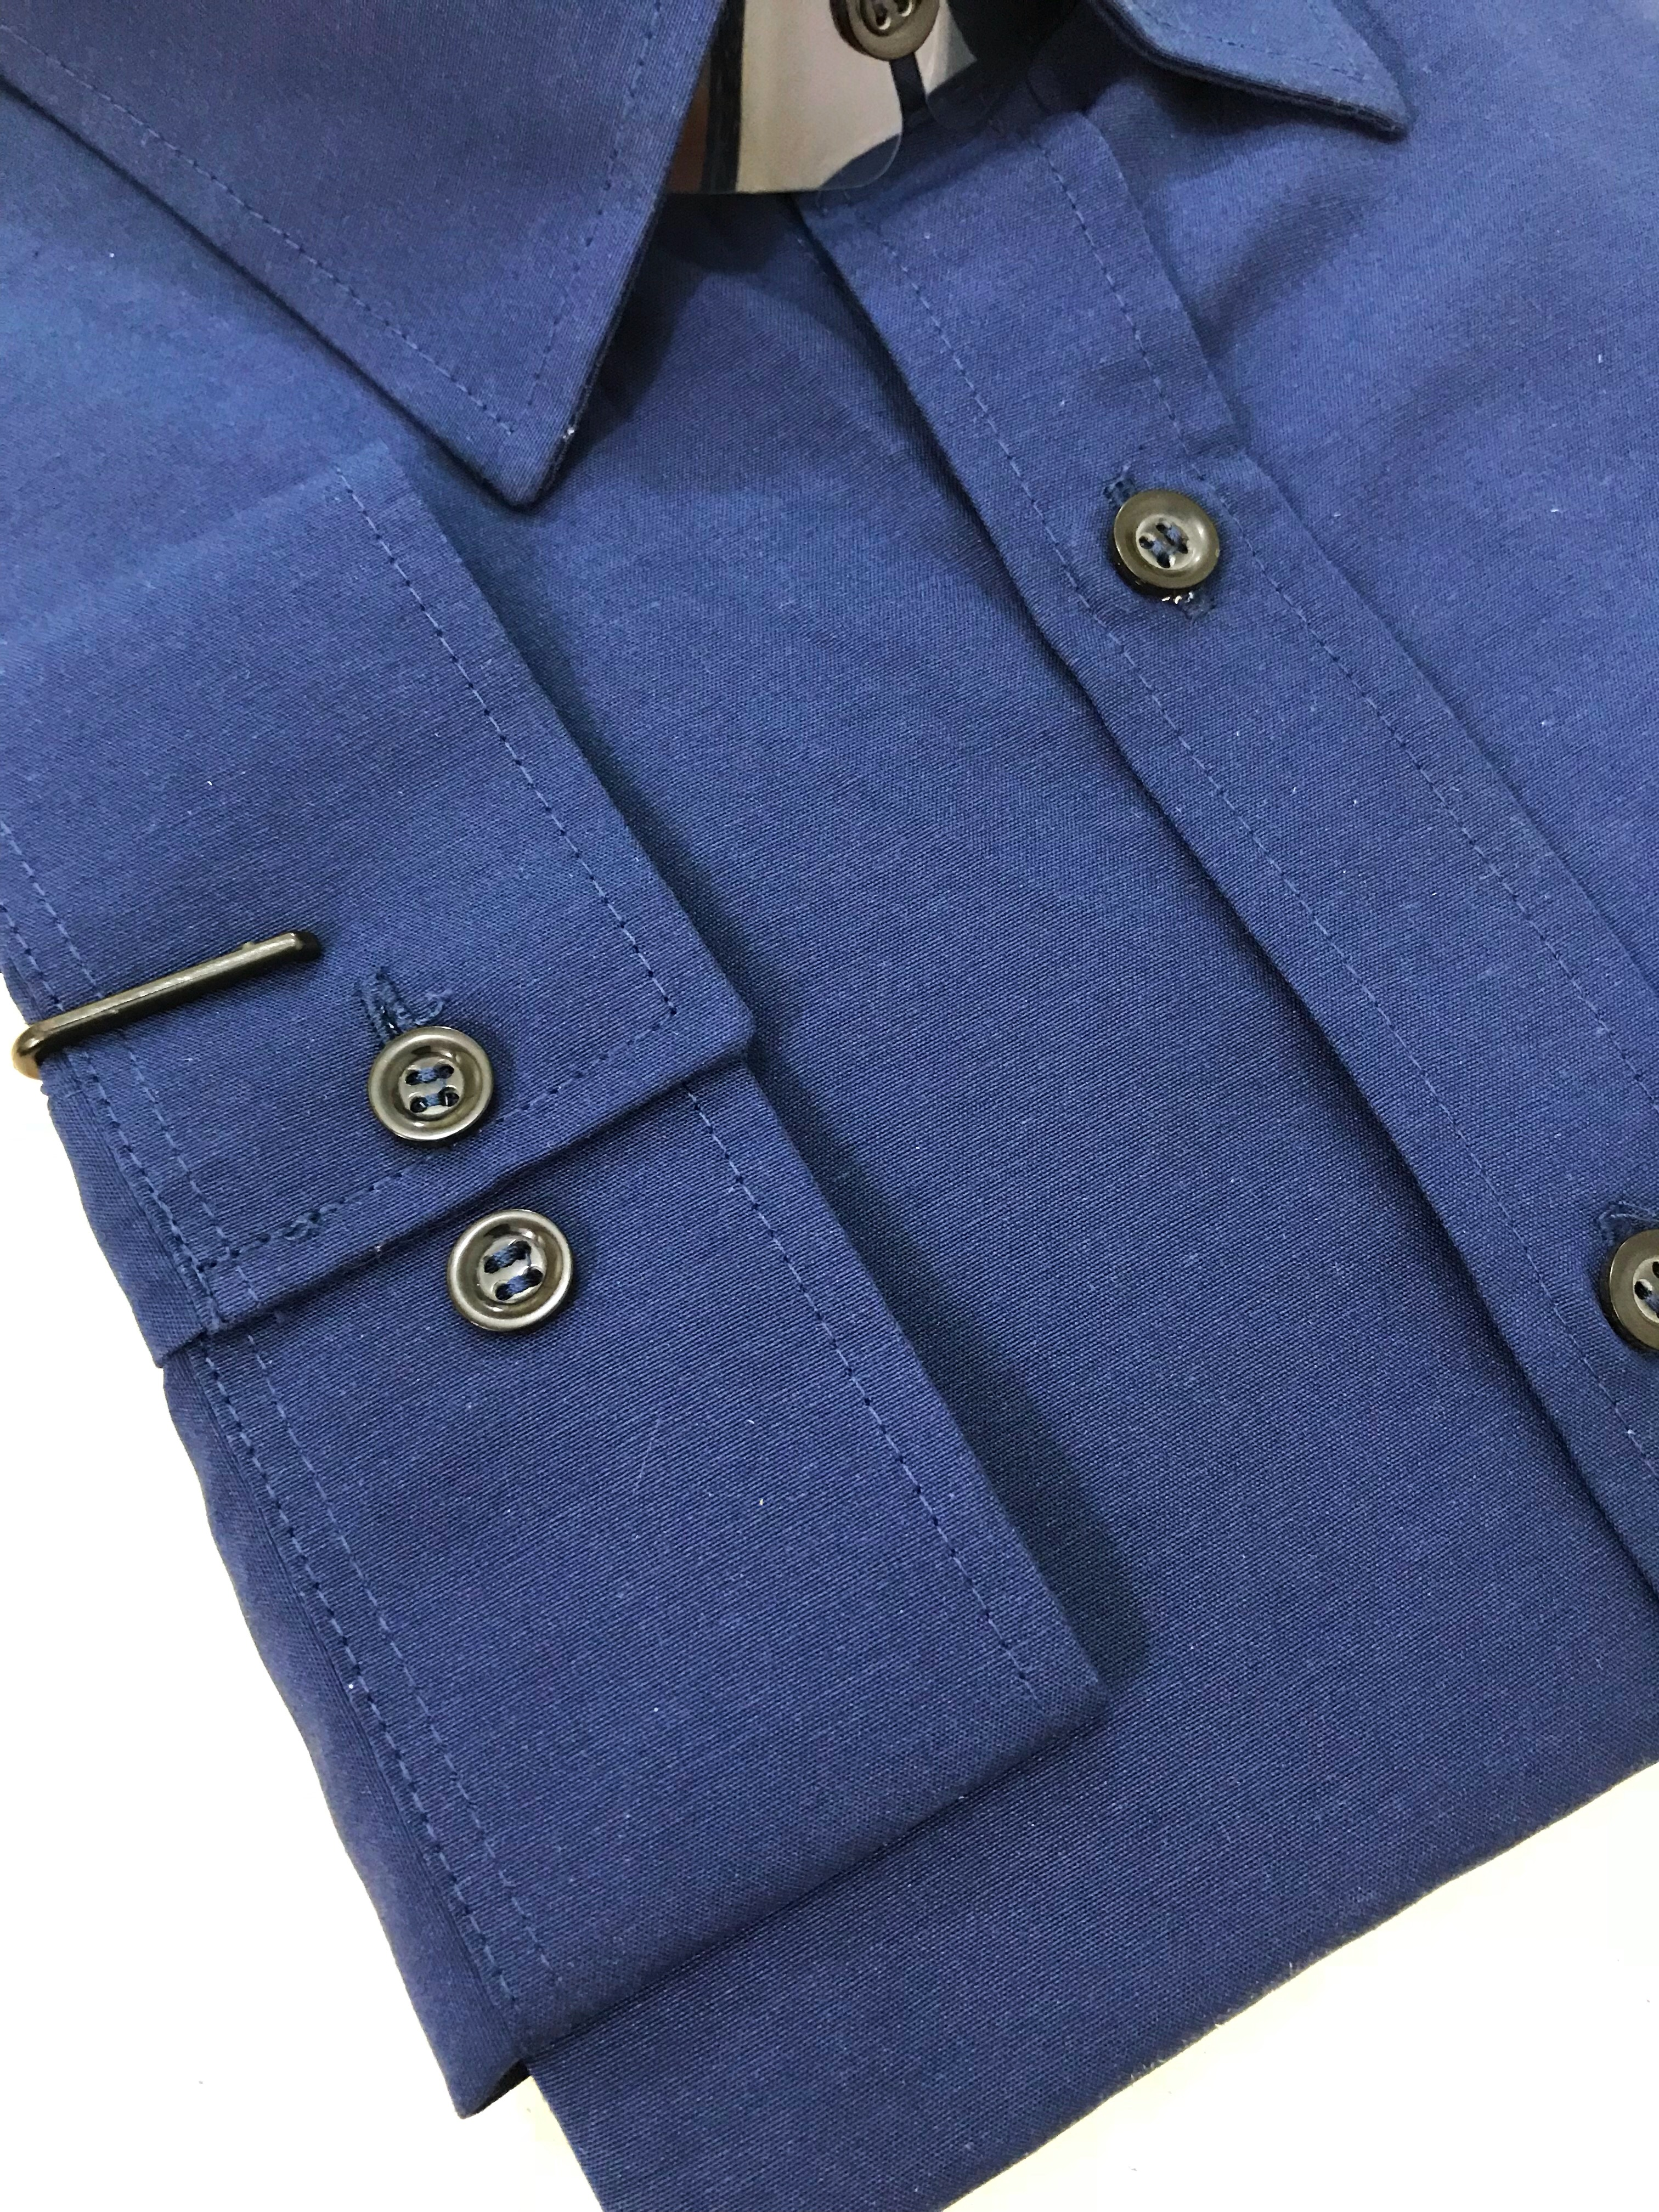 camisa azul plus size